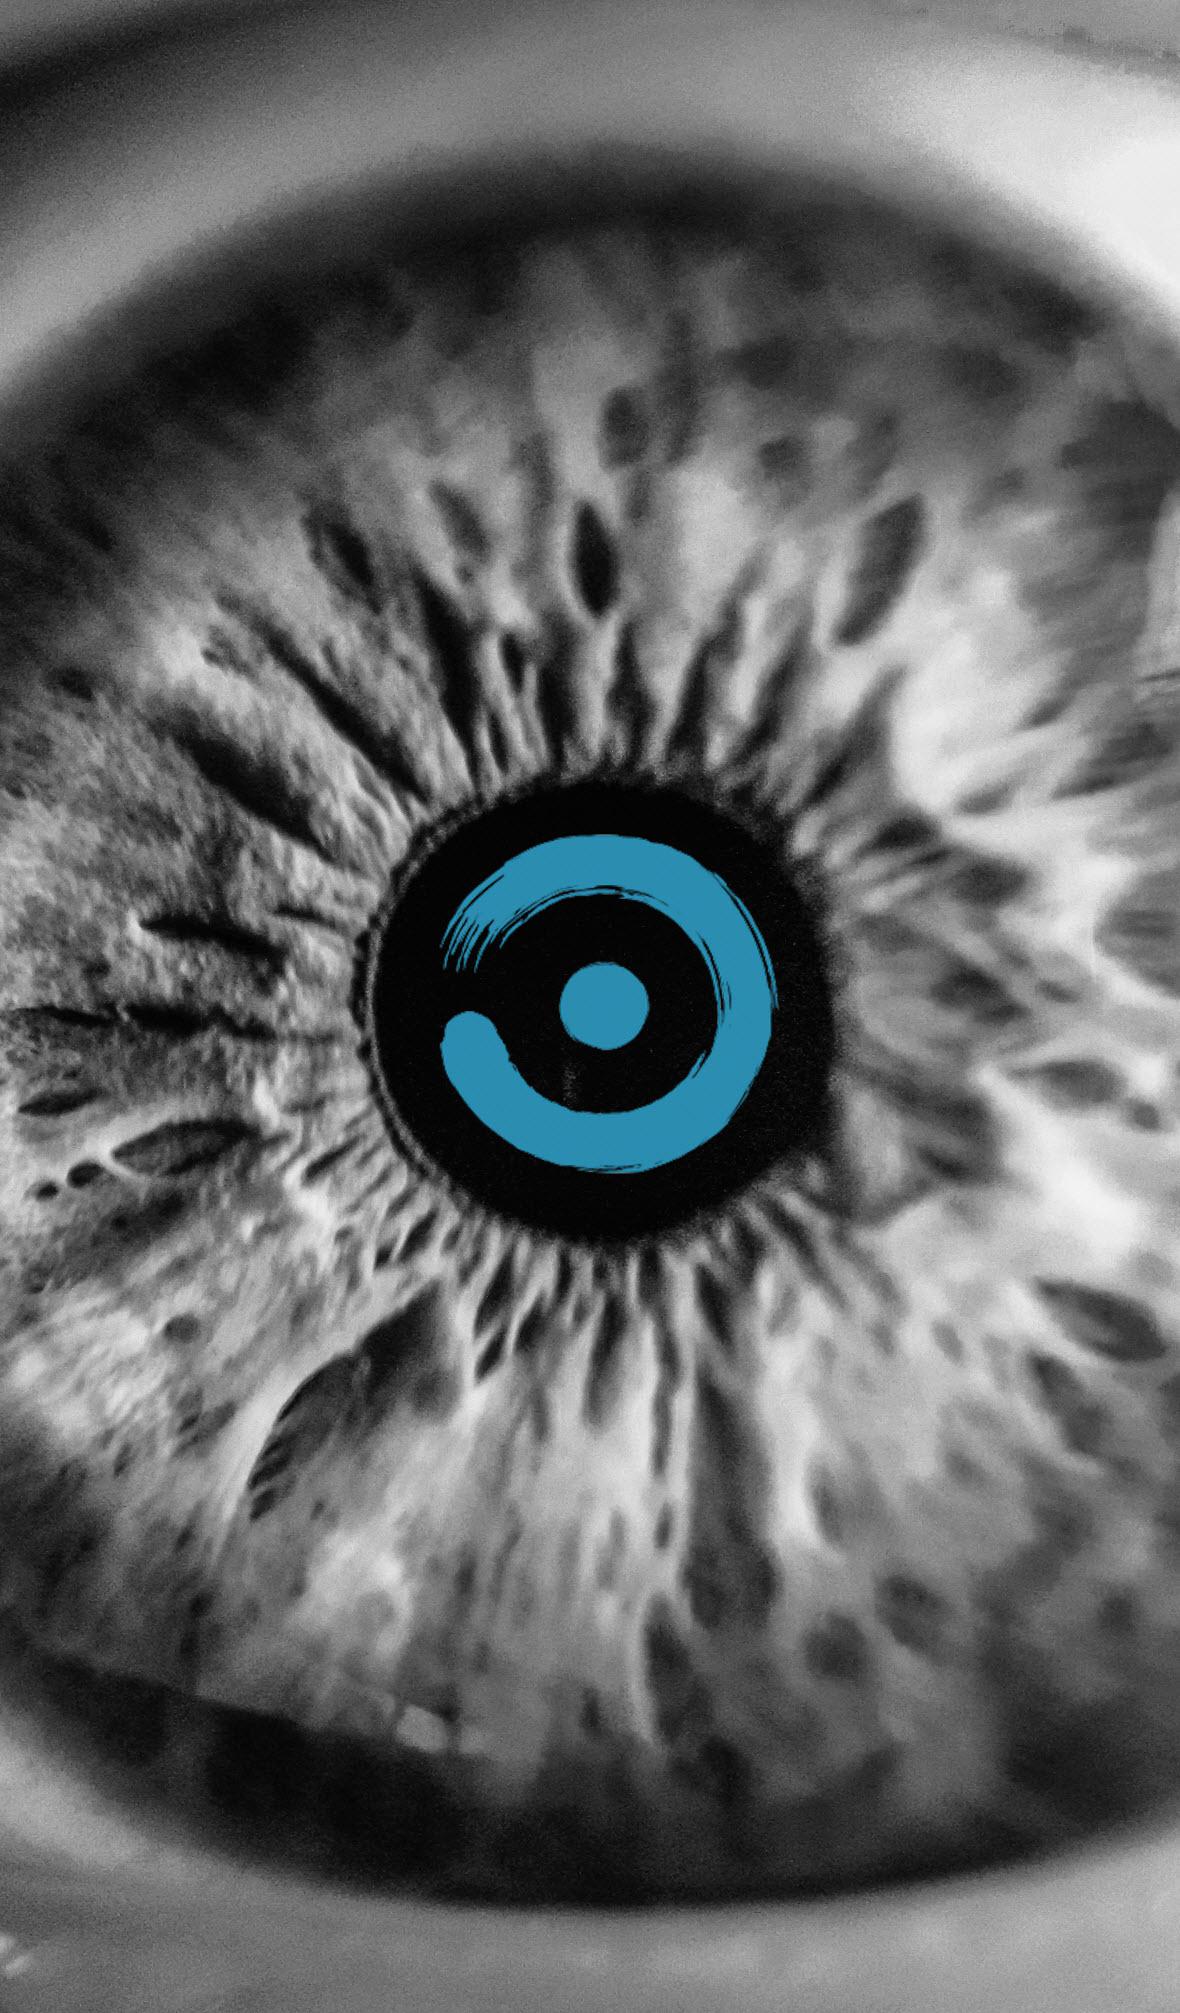 bay eye care logo pupil